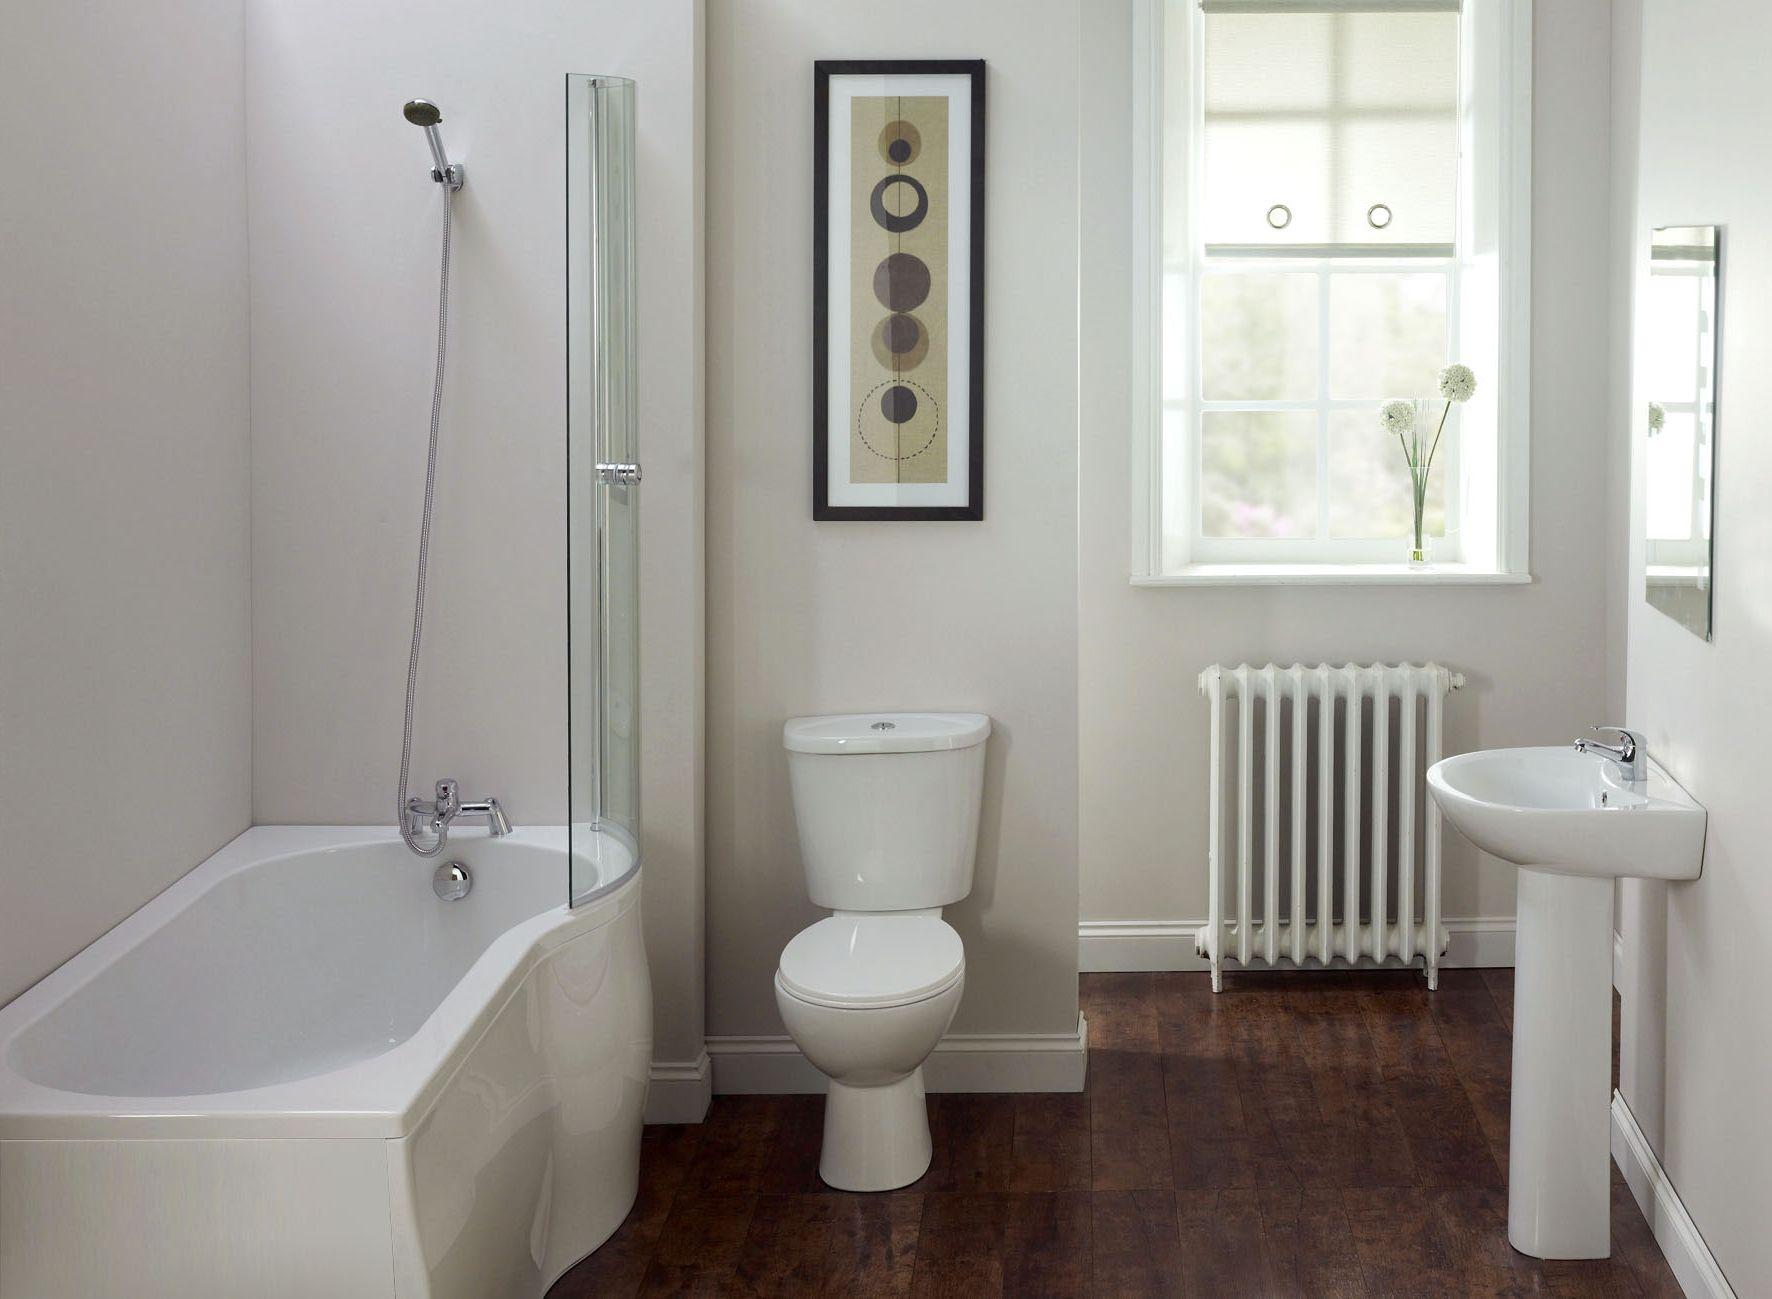 Ordinaire Bathroom, Small White Bathroom Ideas For Simple White Home Interior Design  With Small White Bathtub